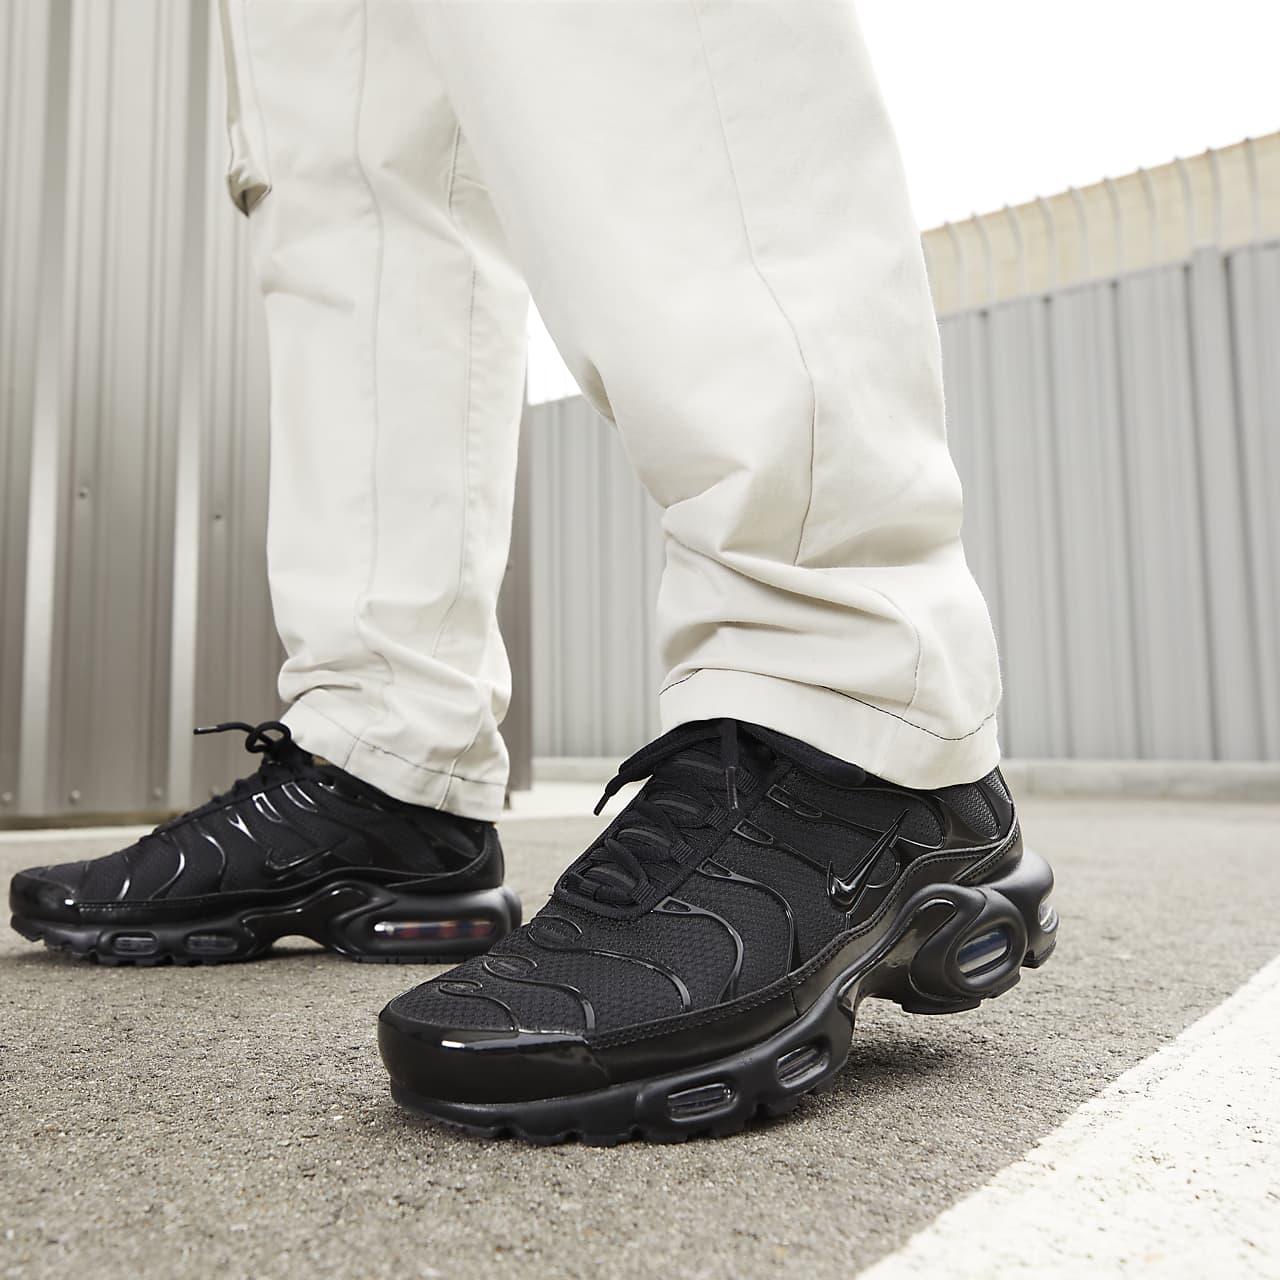 Chaussure Nike Air Max Plus pour Homme. Nike CA